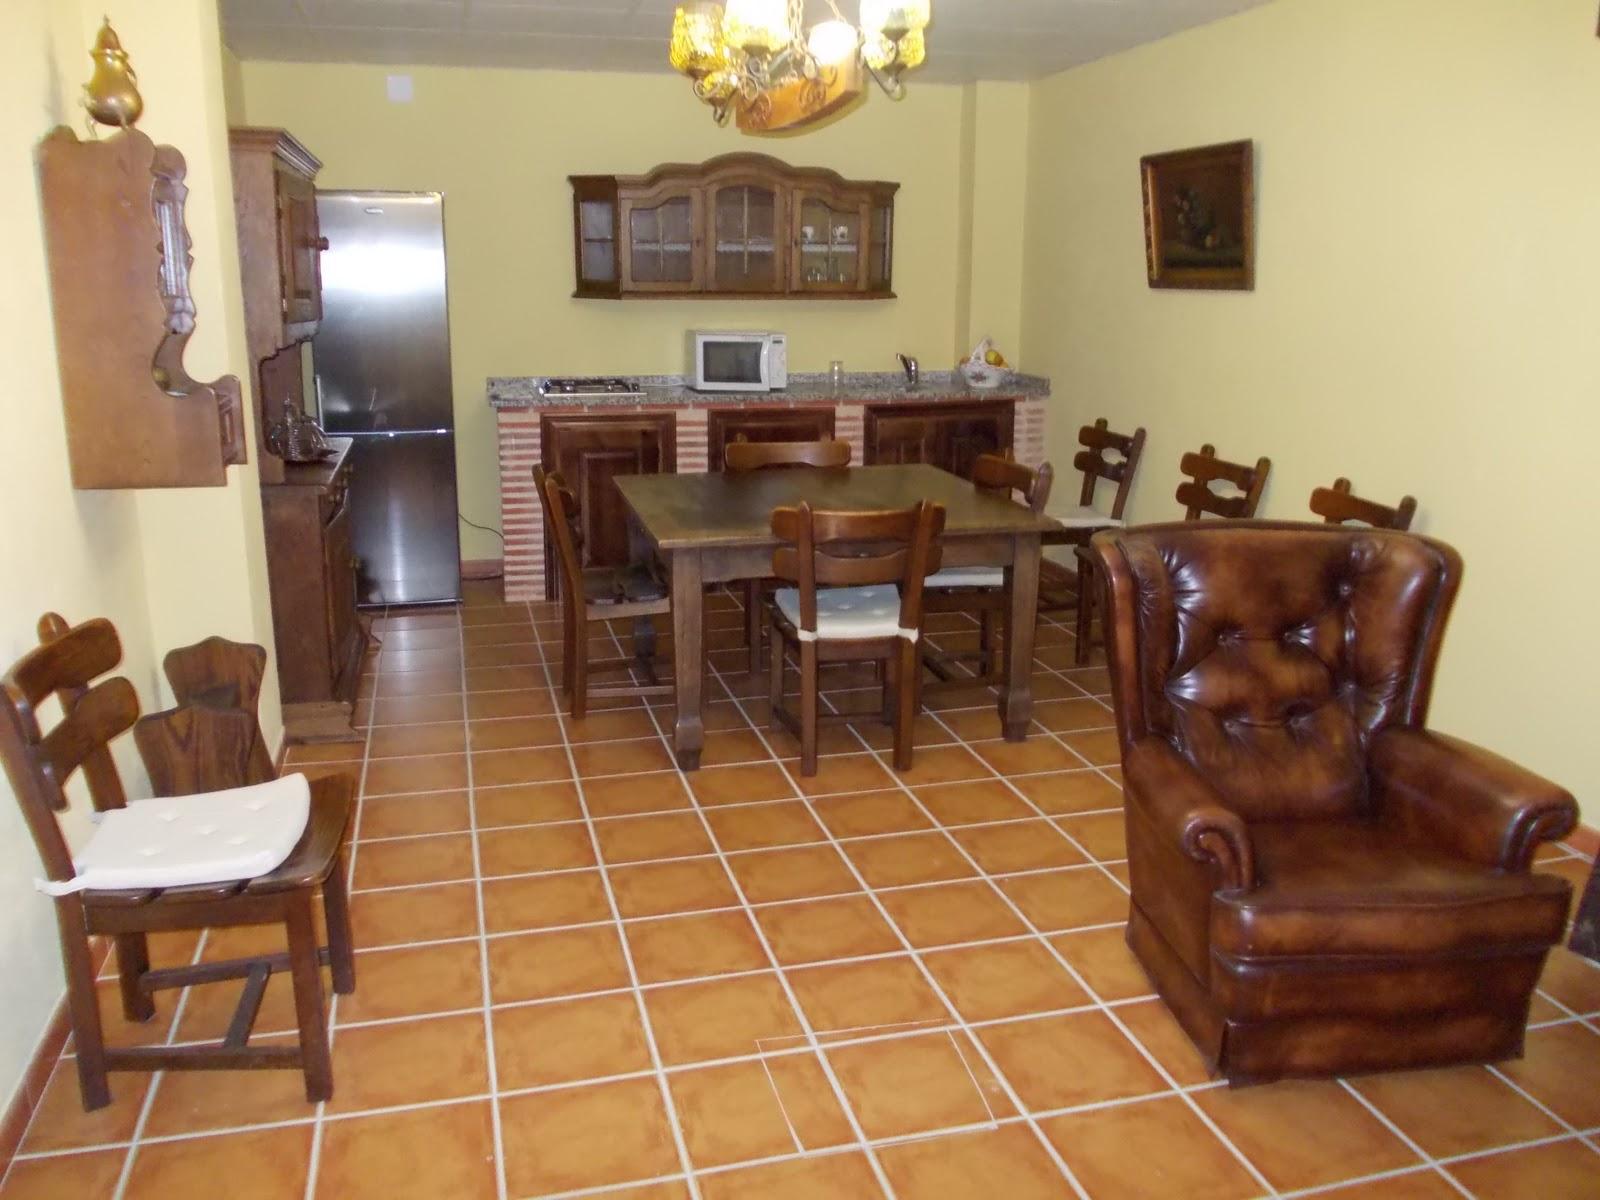 Decoraci n r stica muebles el juncal bodega particular - Decoracion bodegas rusticas ...